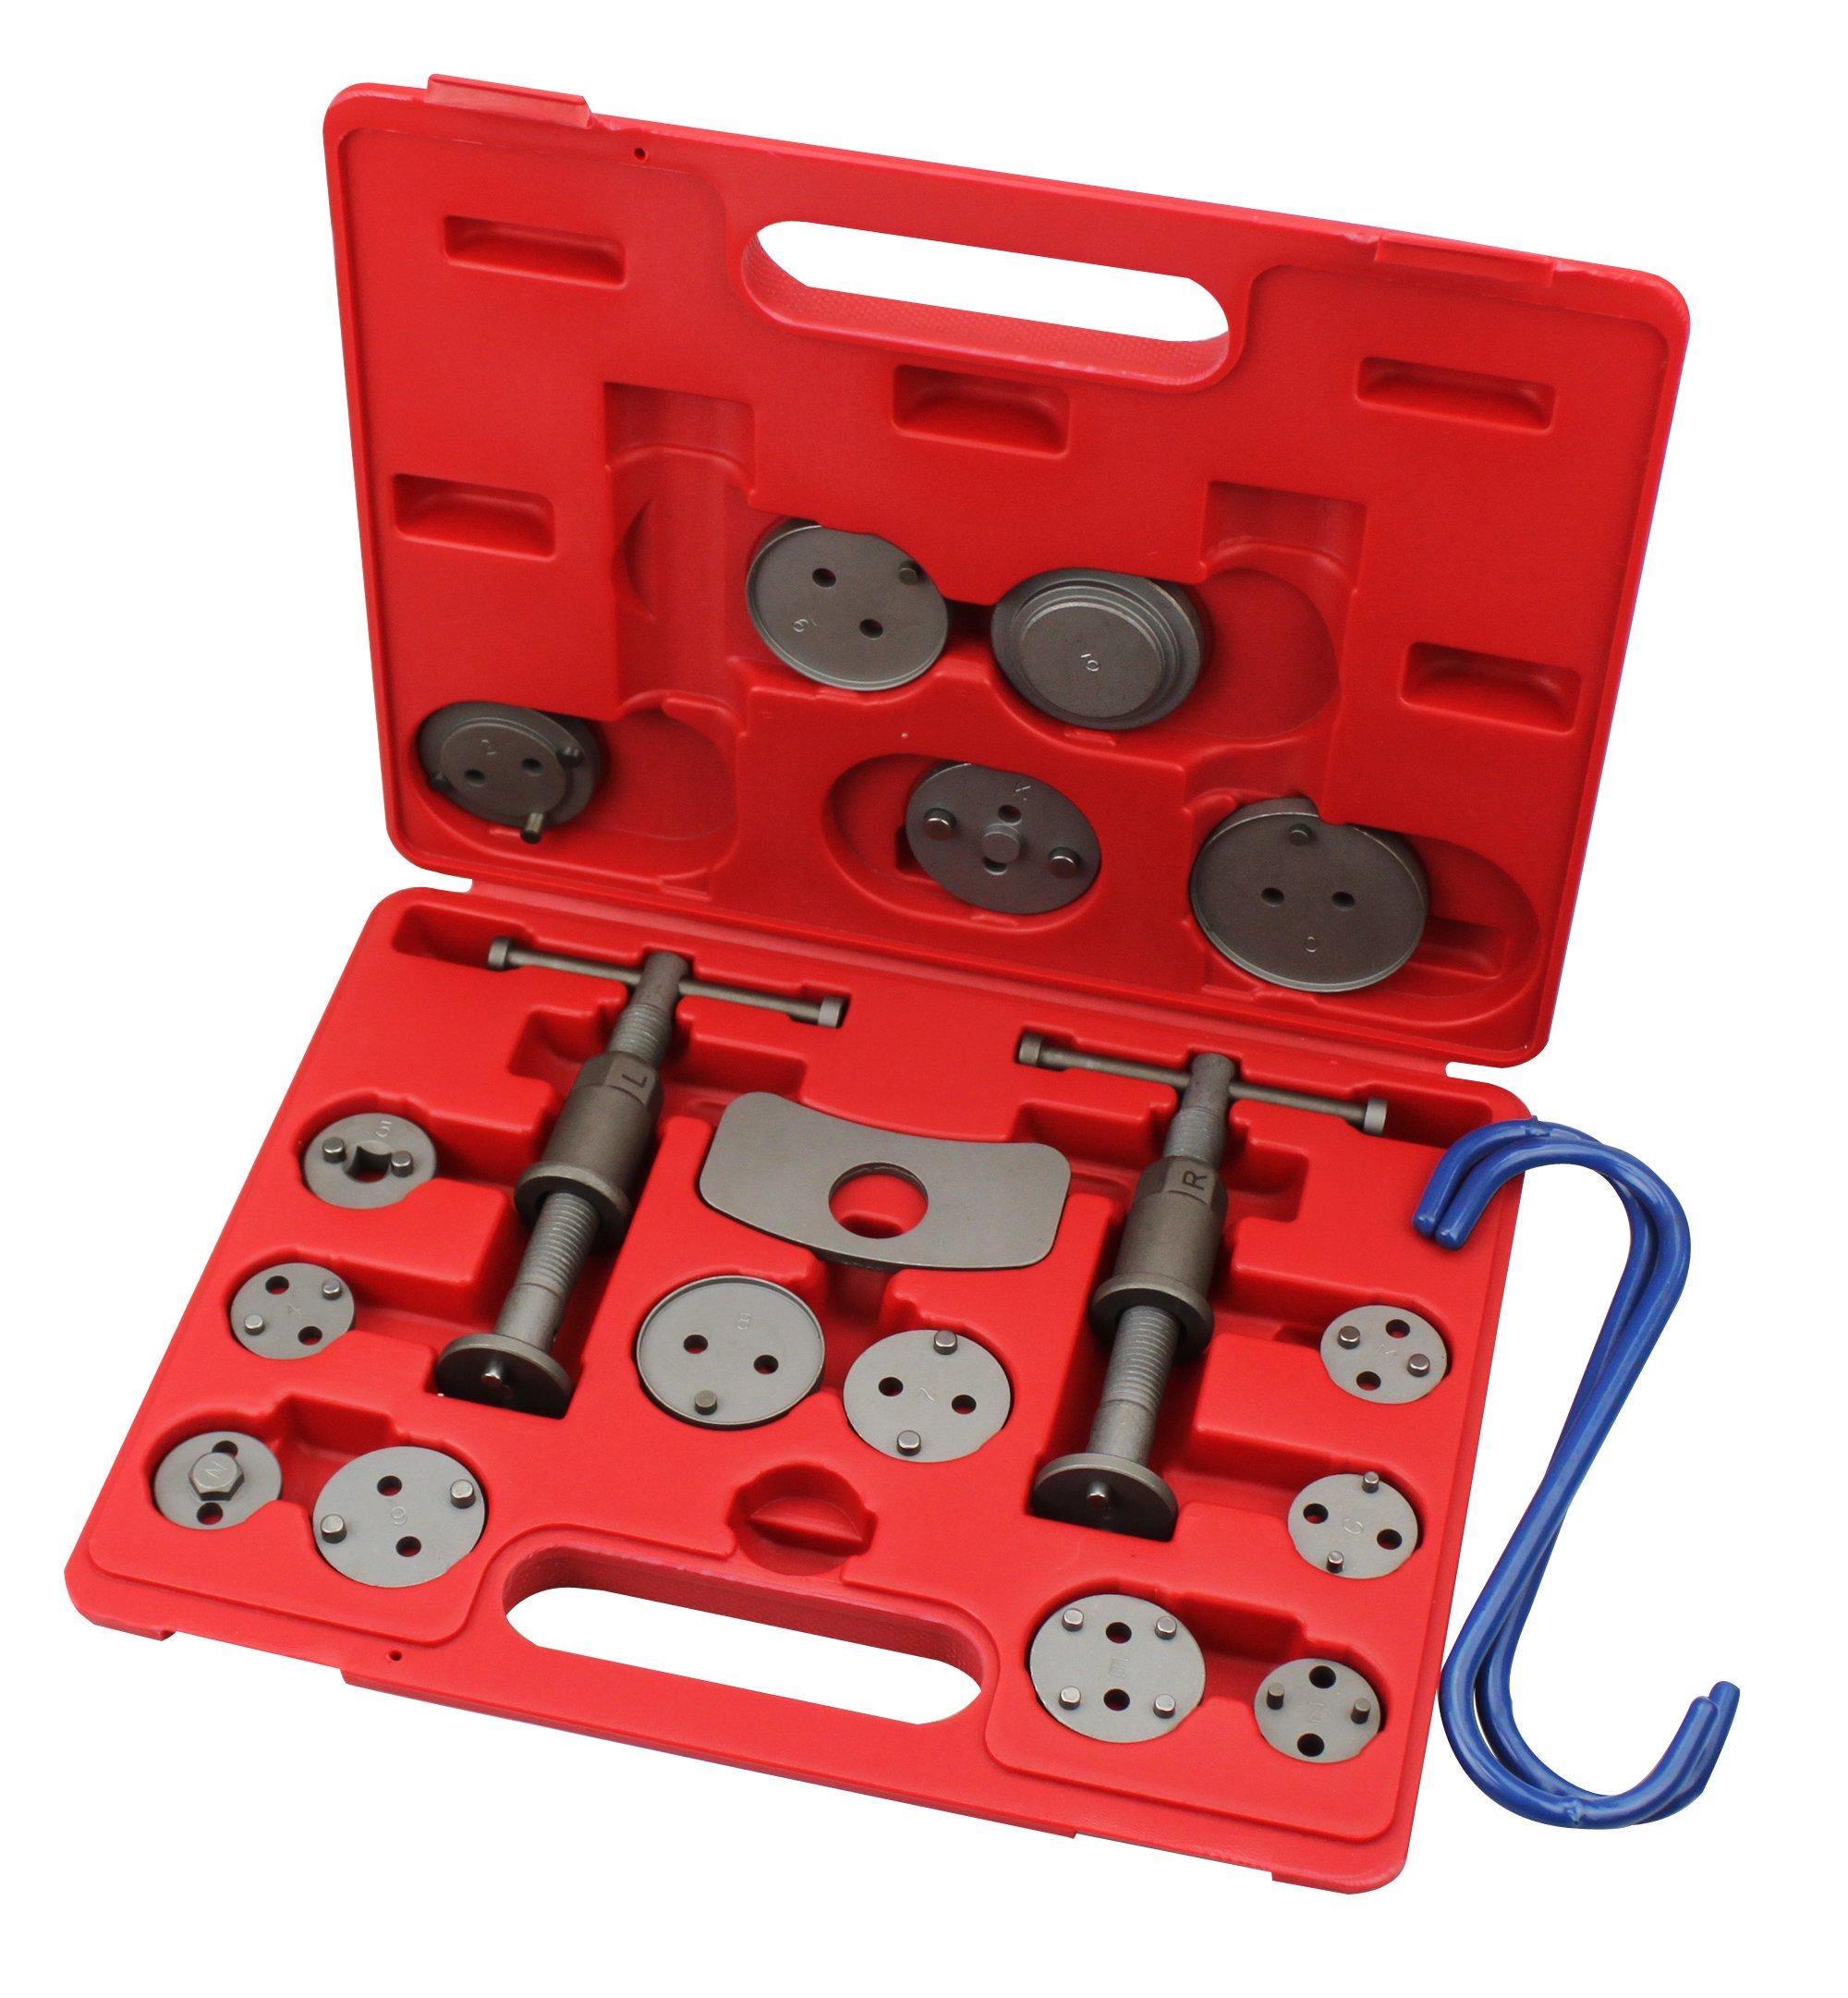 Kauplus Break Caliper wind Back Tool Set Wind Back Tool Kit Disc Brake Caliper Piston Pad Car W/Caliper Hangers